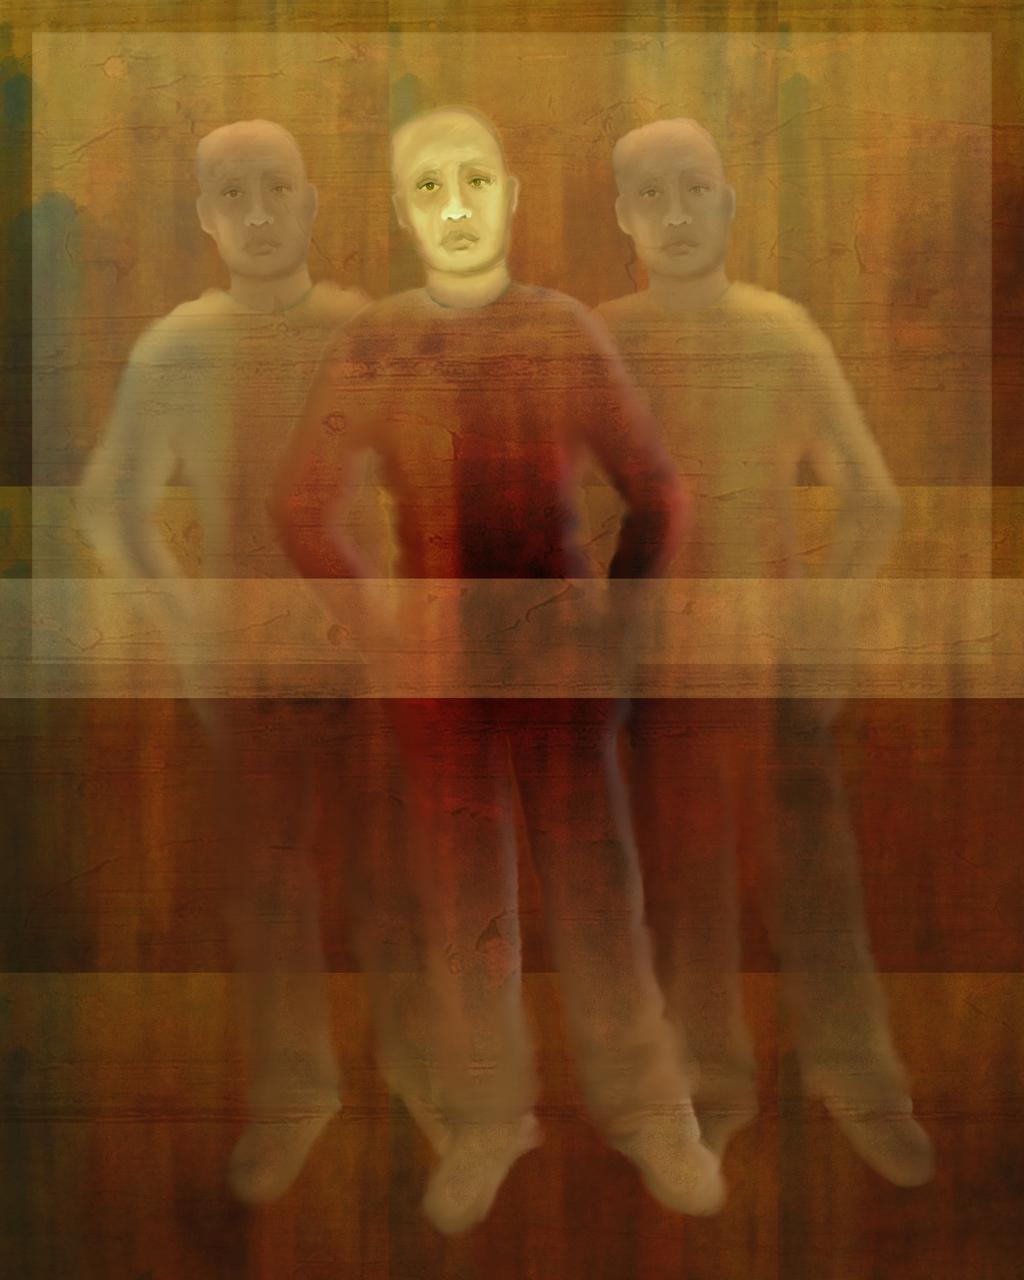 Ten: Digital painting by Marina Flournoy